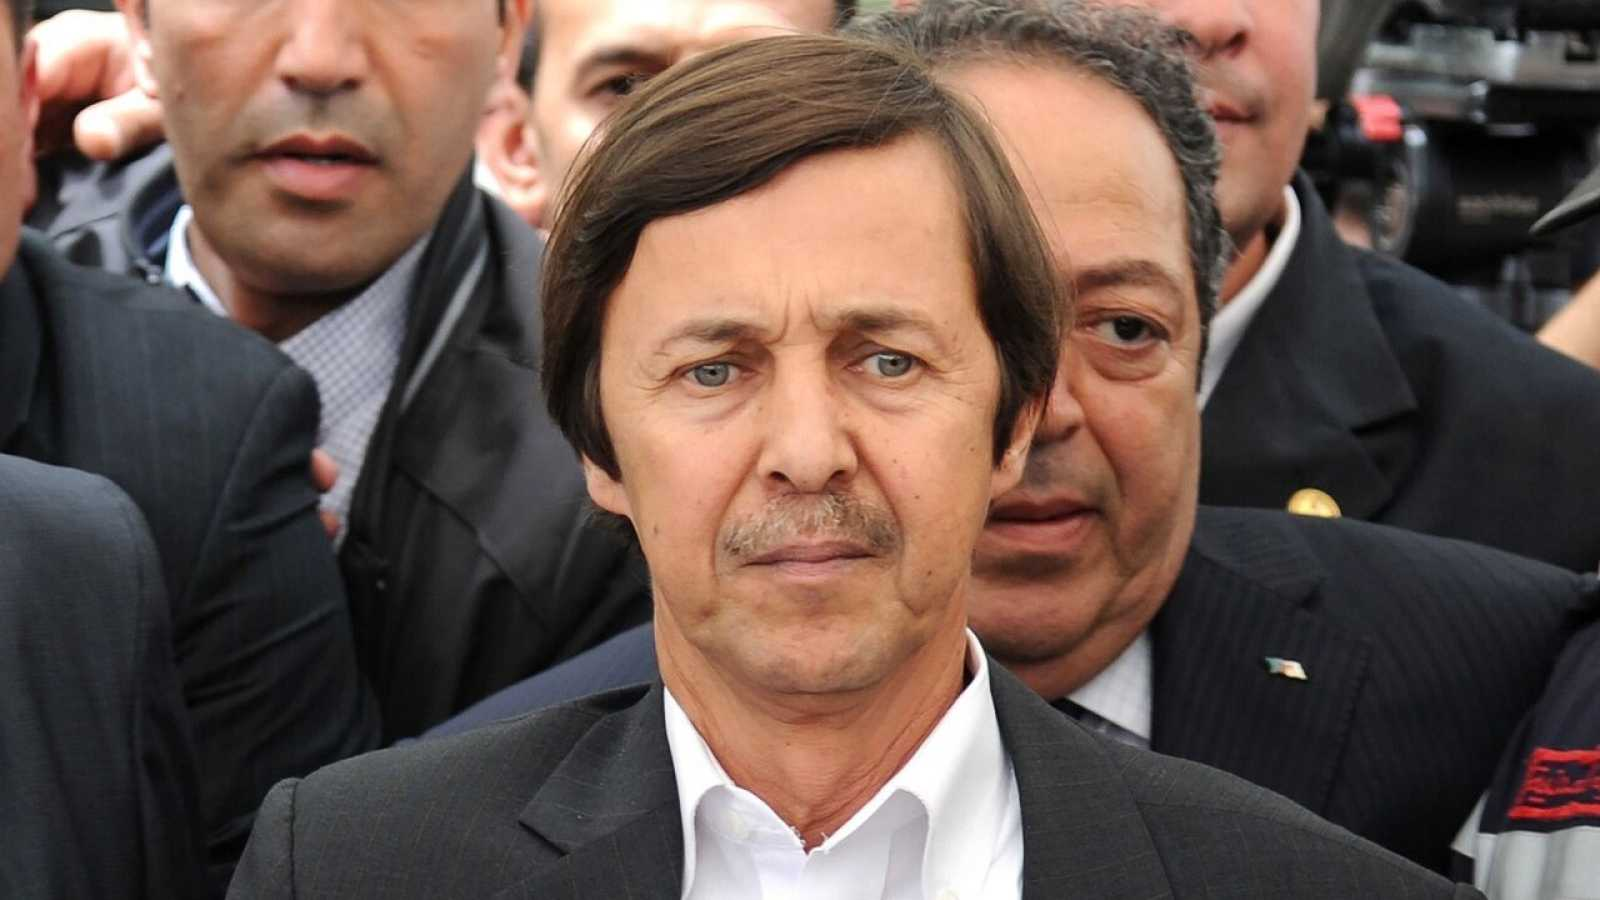 Imagen de archivo de Said Bouteflika, hermano del expresidente argelino Abdelaziz Bouteflika